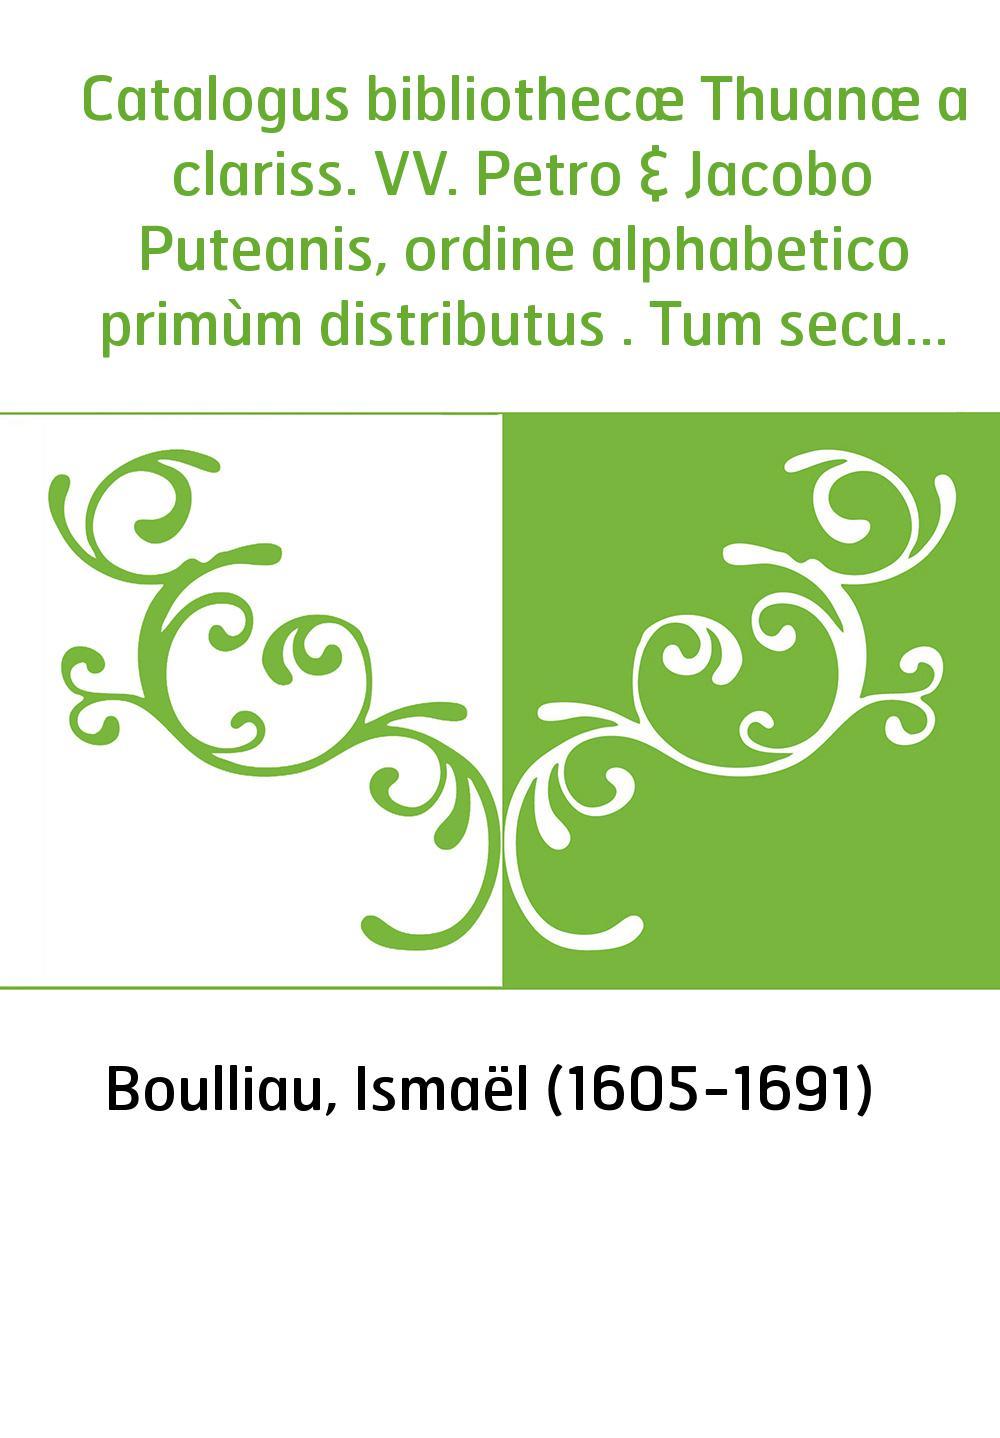 Catalogus bibliothecæ Thuanæ a clariss. VV. Petro & Jacobo Puteanis, ordine alphabetico primùm distributus . Tum secundum scient